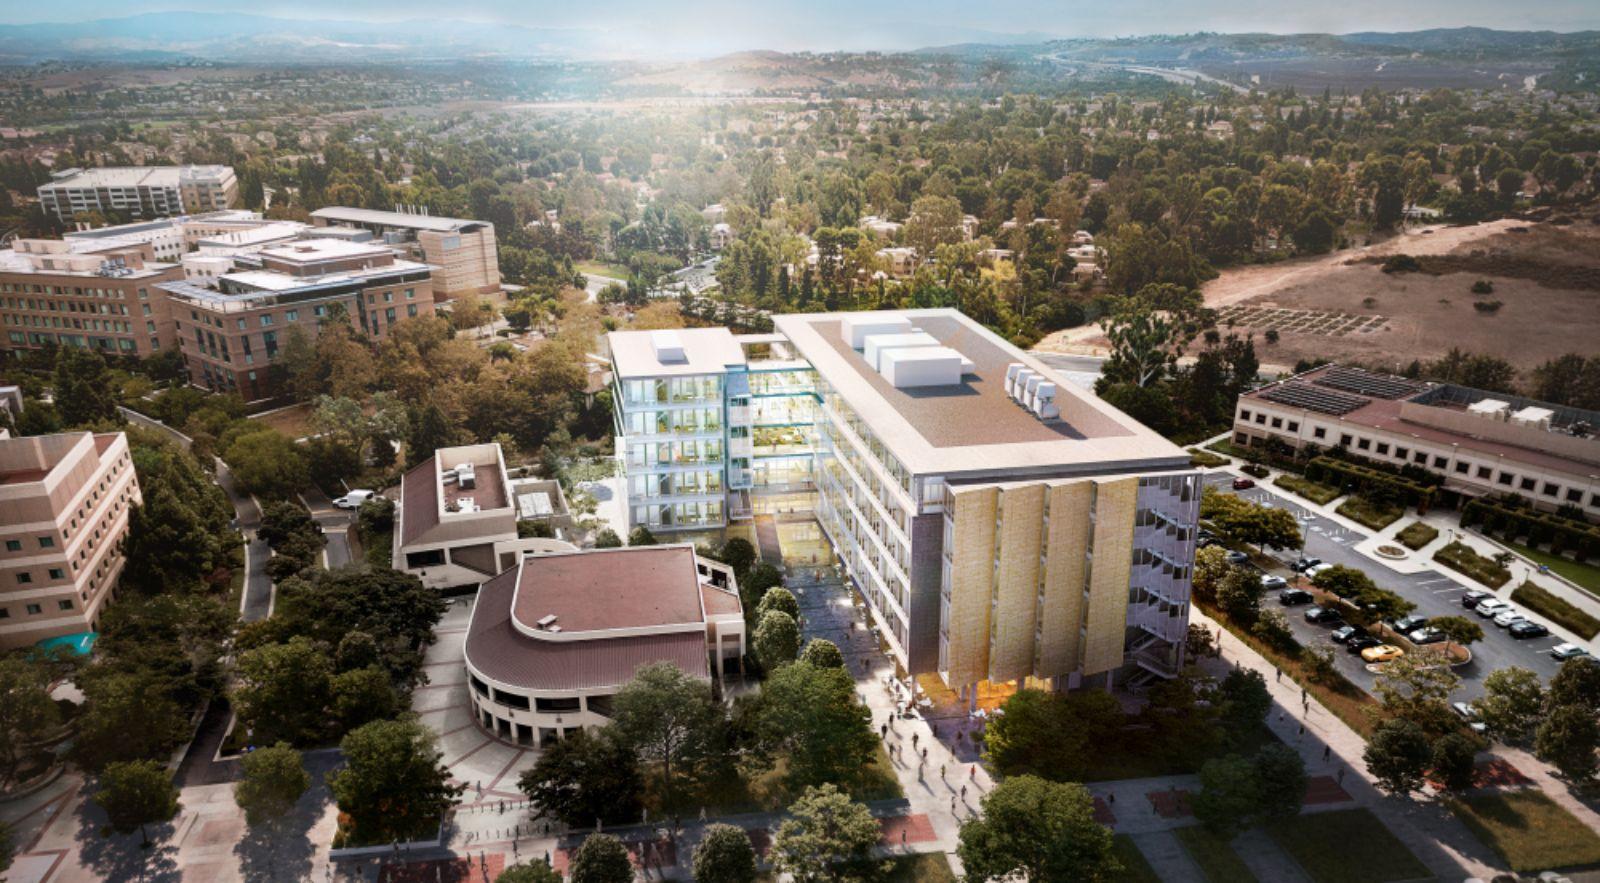 Interdisciplinary Science and Engineering Building